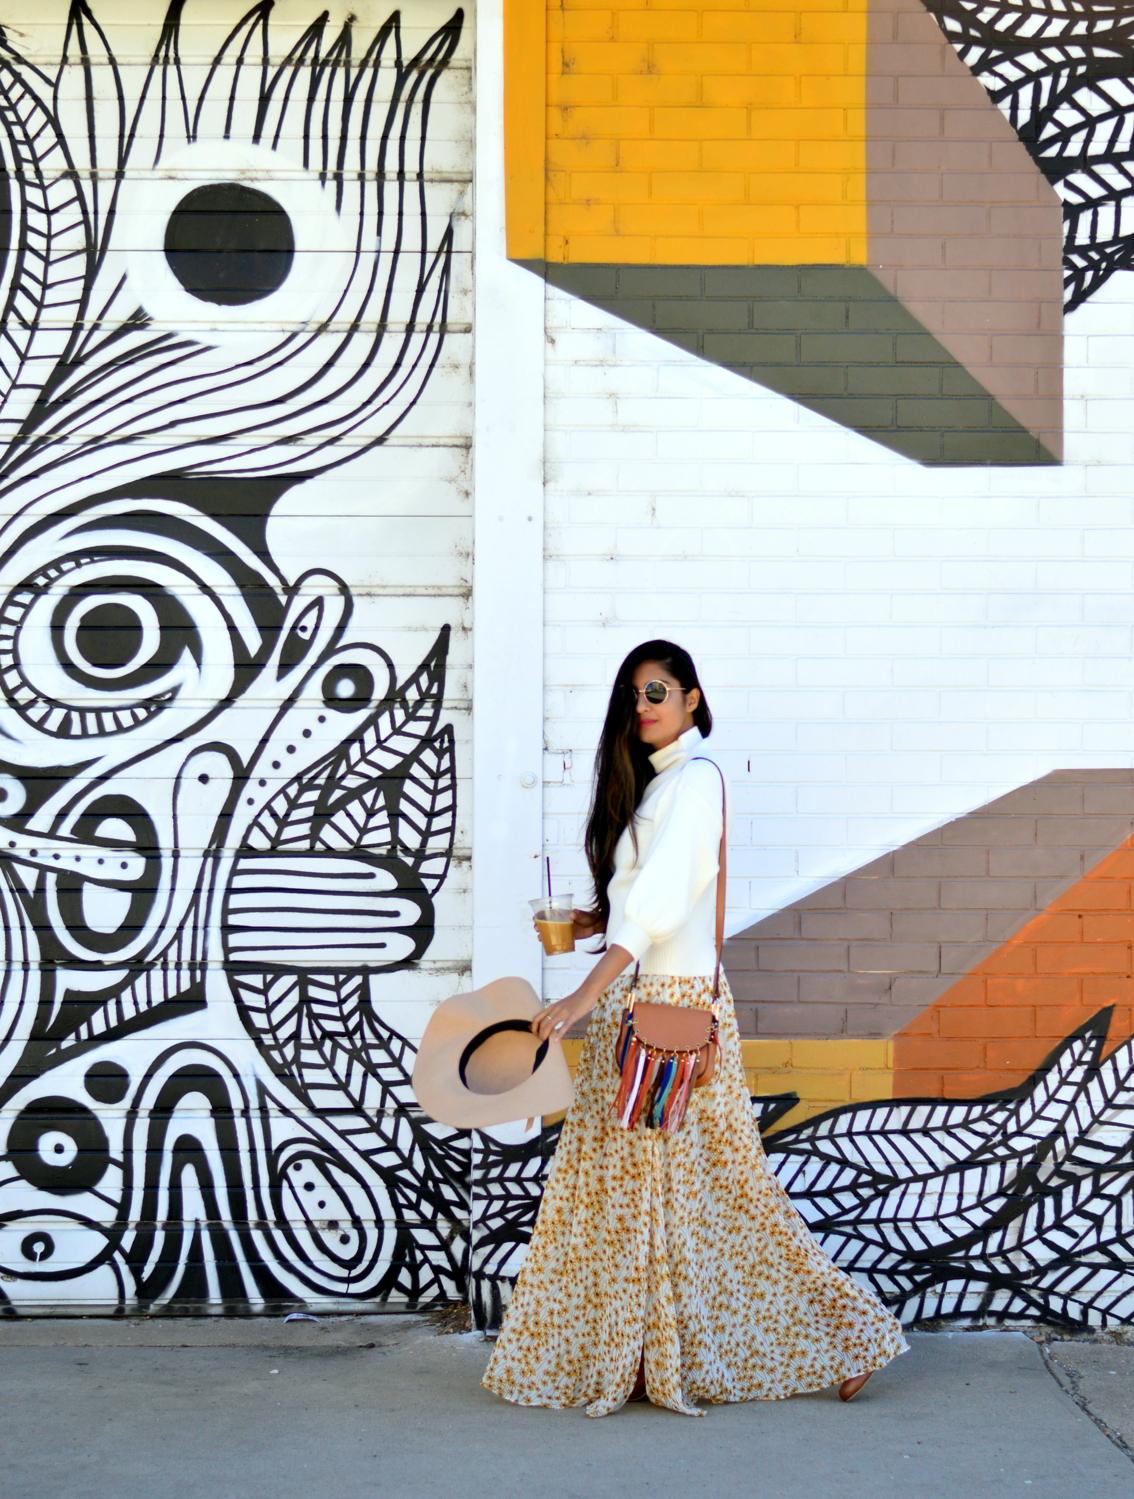 turtleneck-sweater-boho-floral-maxi-dress-travel-Denver-style 1